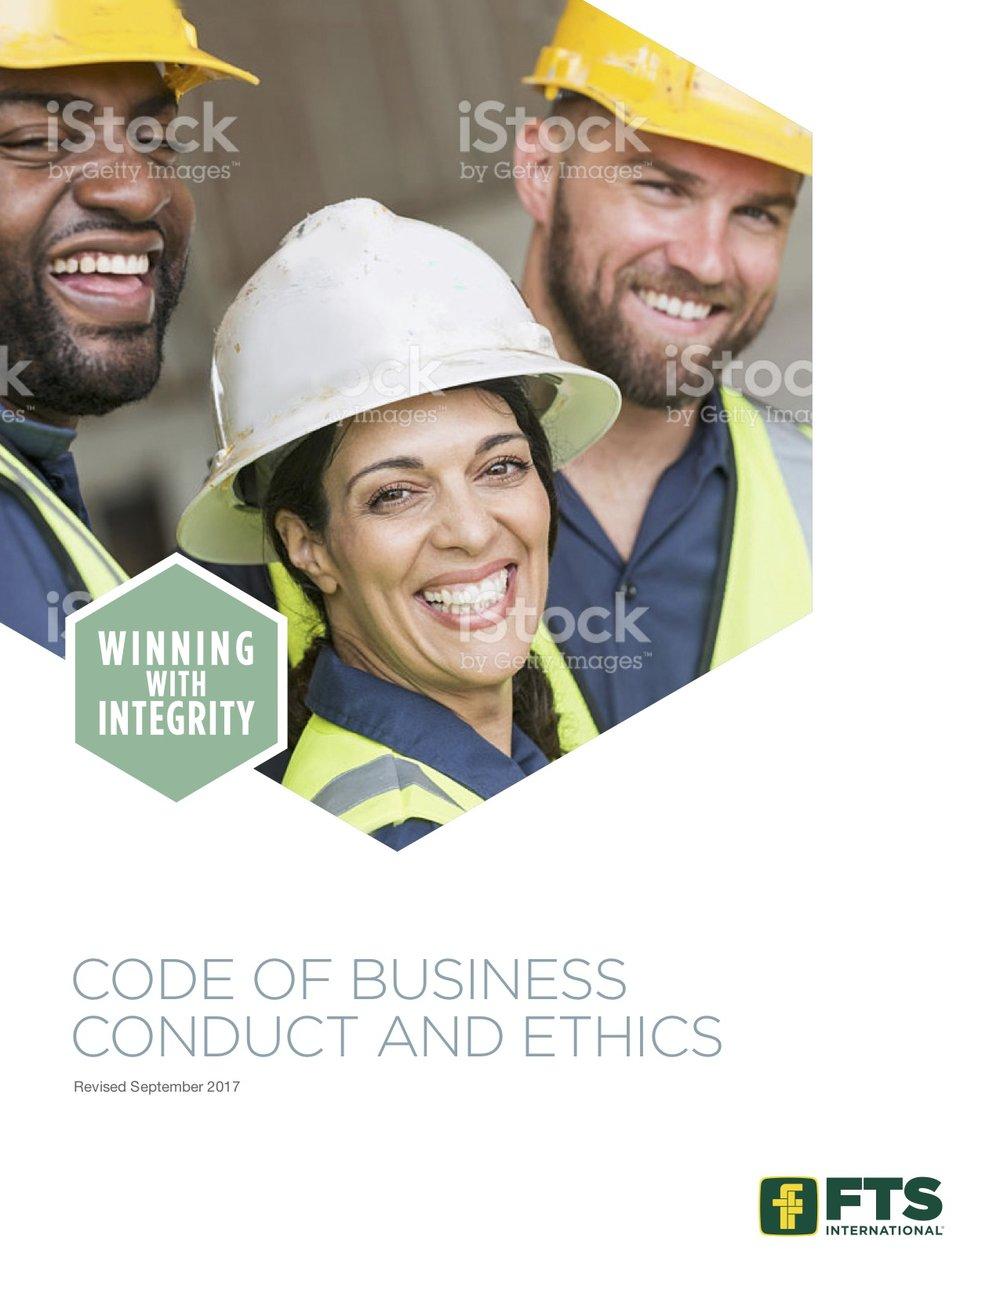 FTSI: Code of Conduct